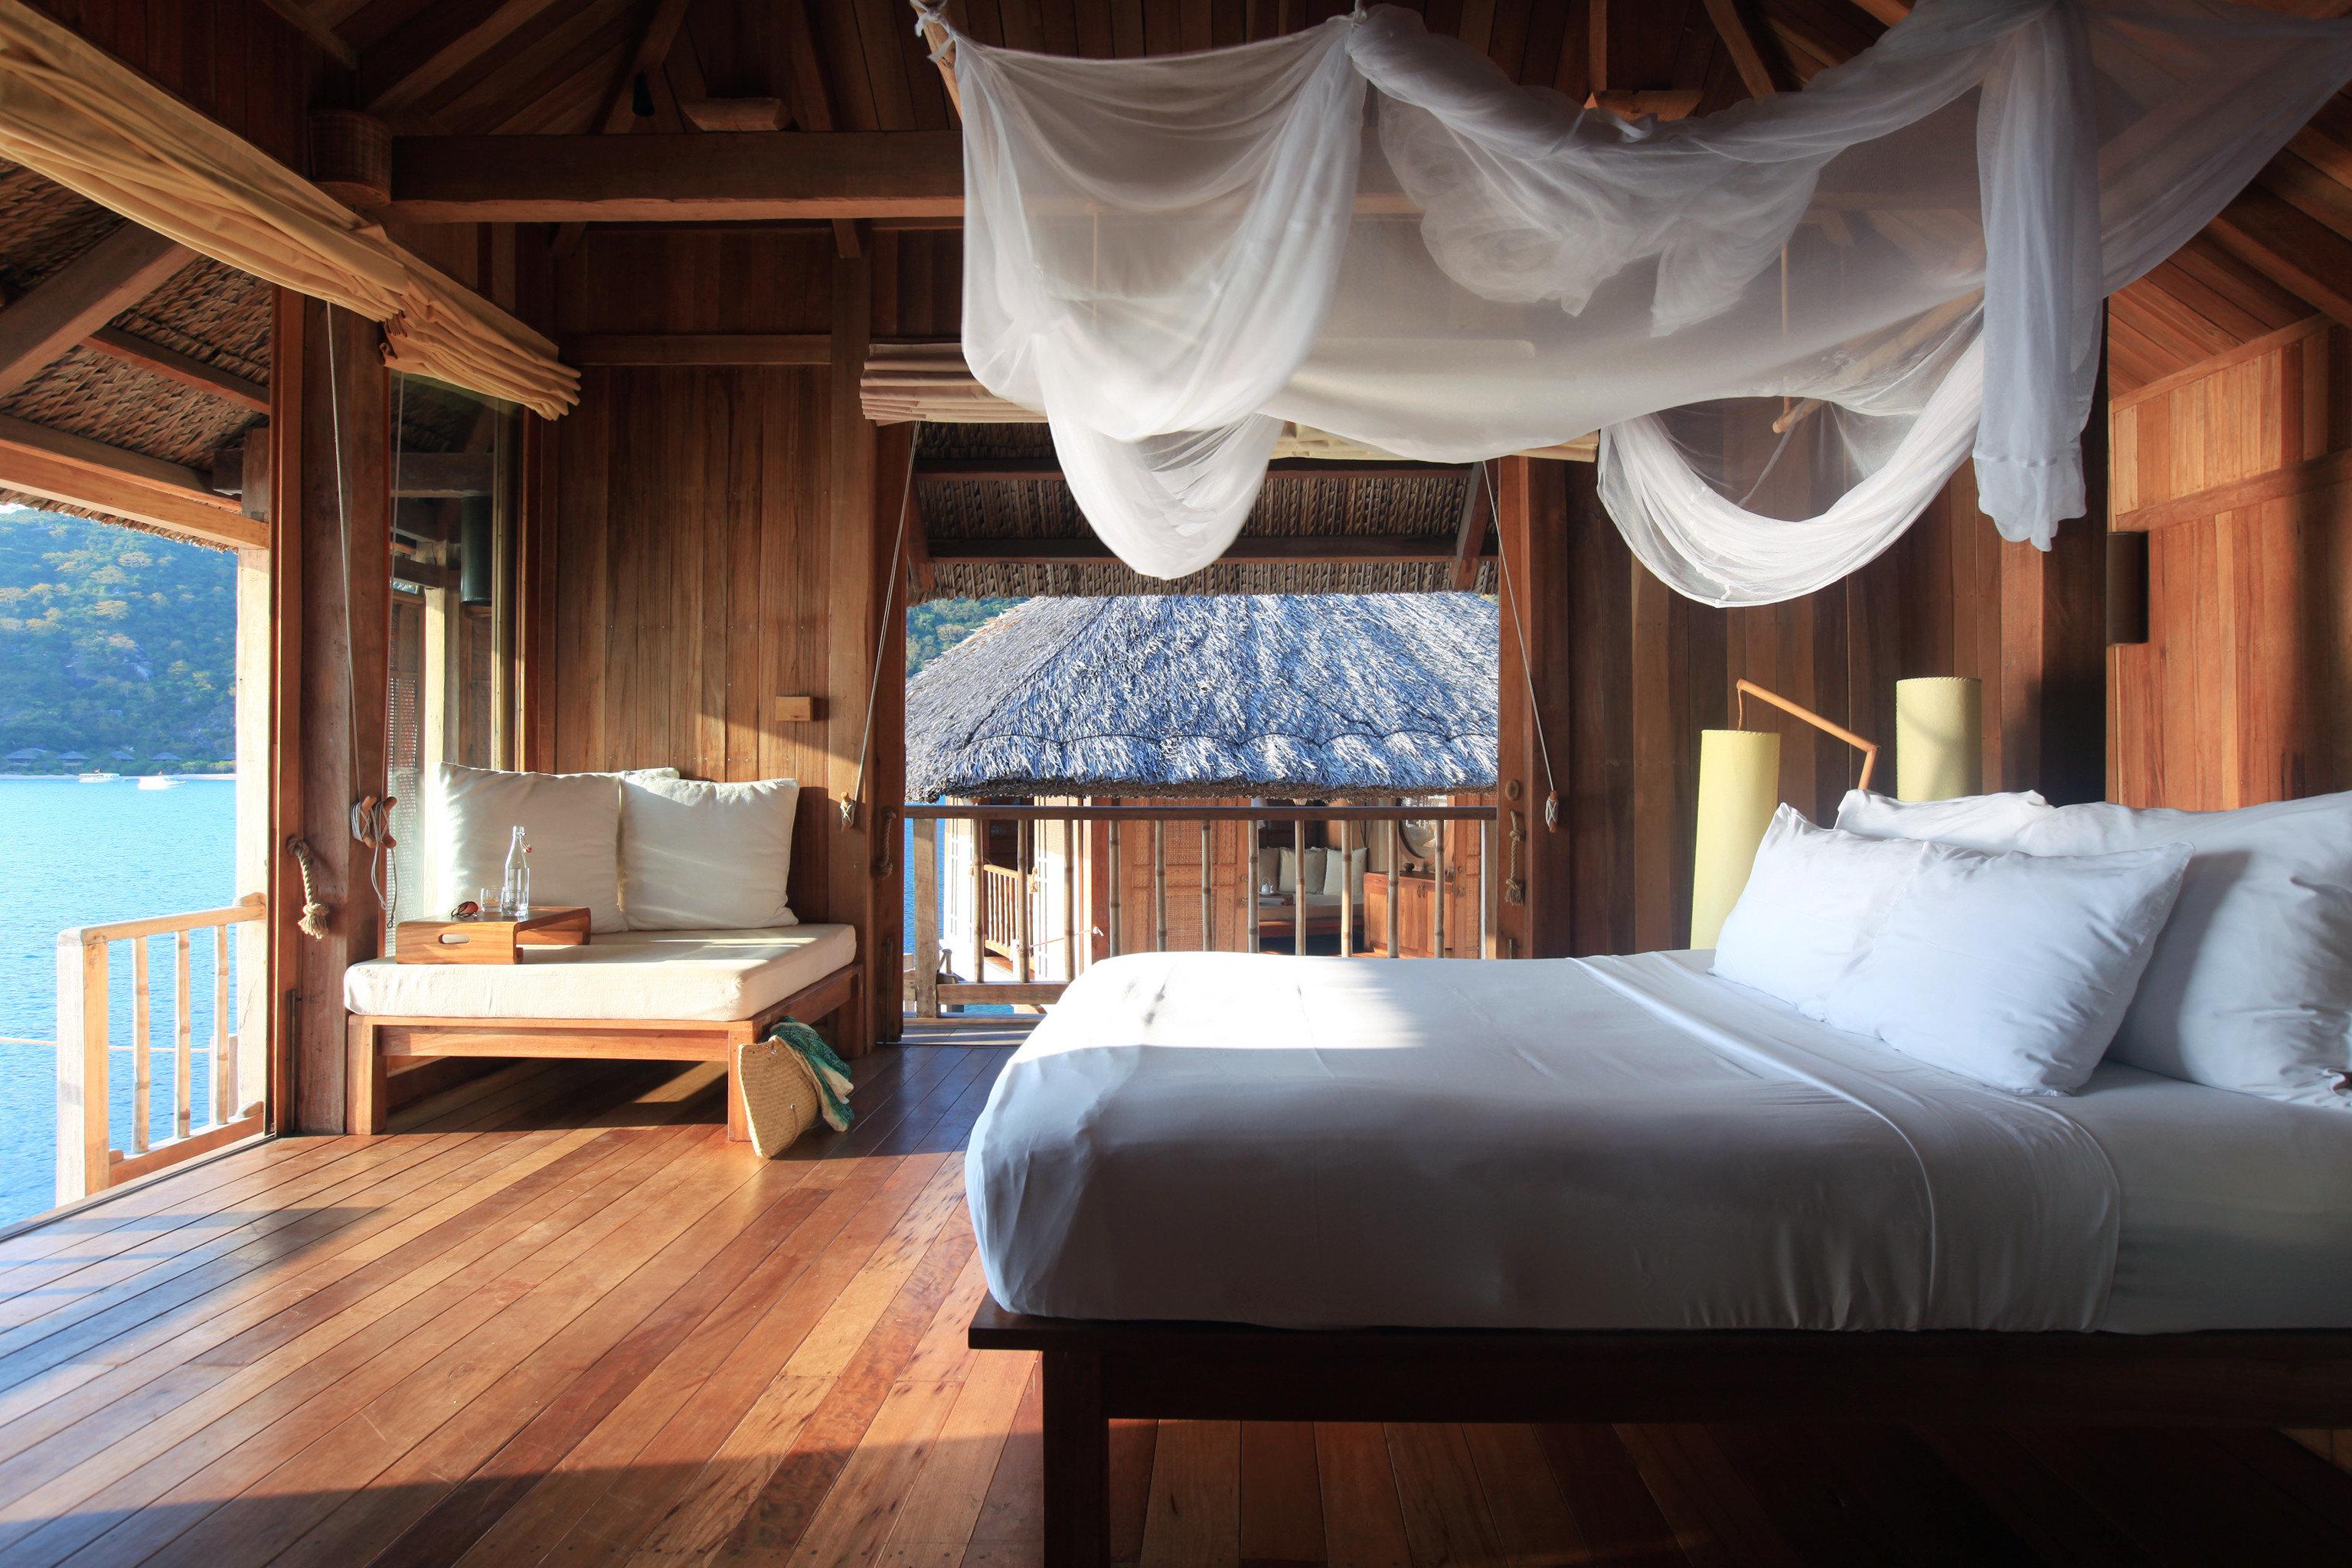 Balcony Beachfront Bedroom Elegant Jungle Romance Scenic views Tropical Villa Waterfront sofa property cottage Suite home Resort living room